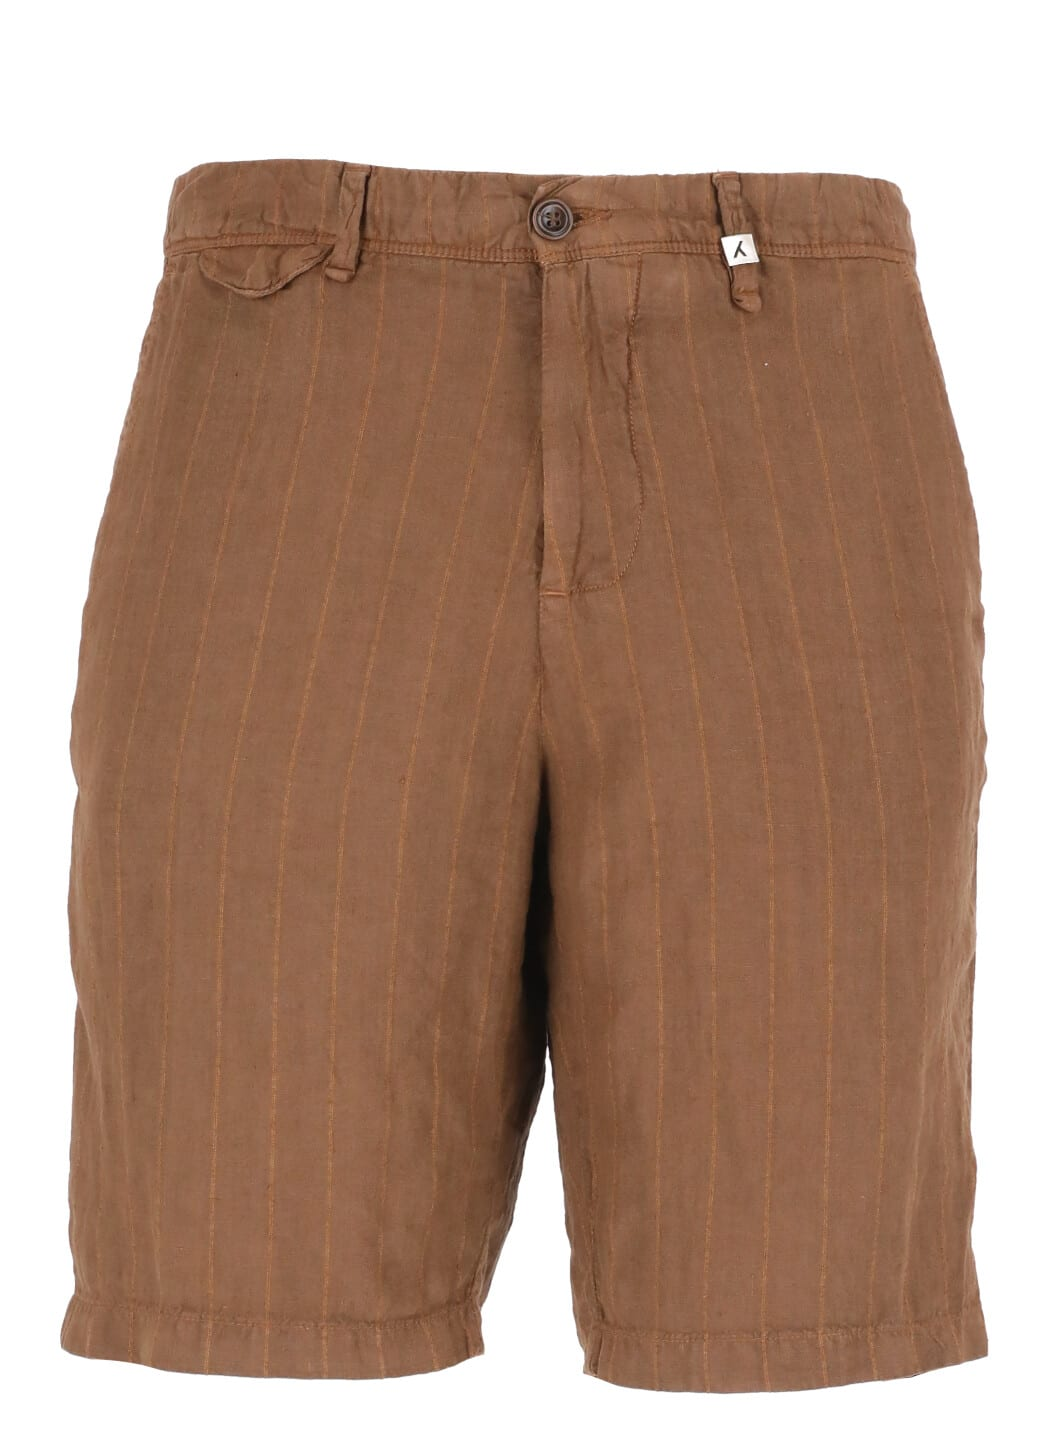 Striped Linen Bermuda Short